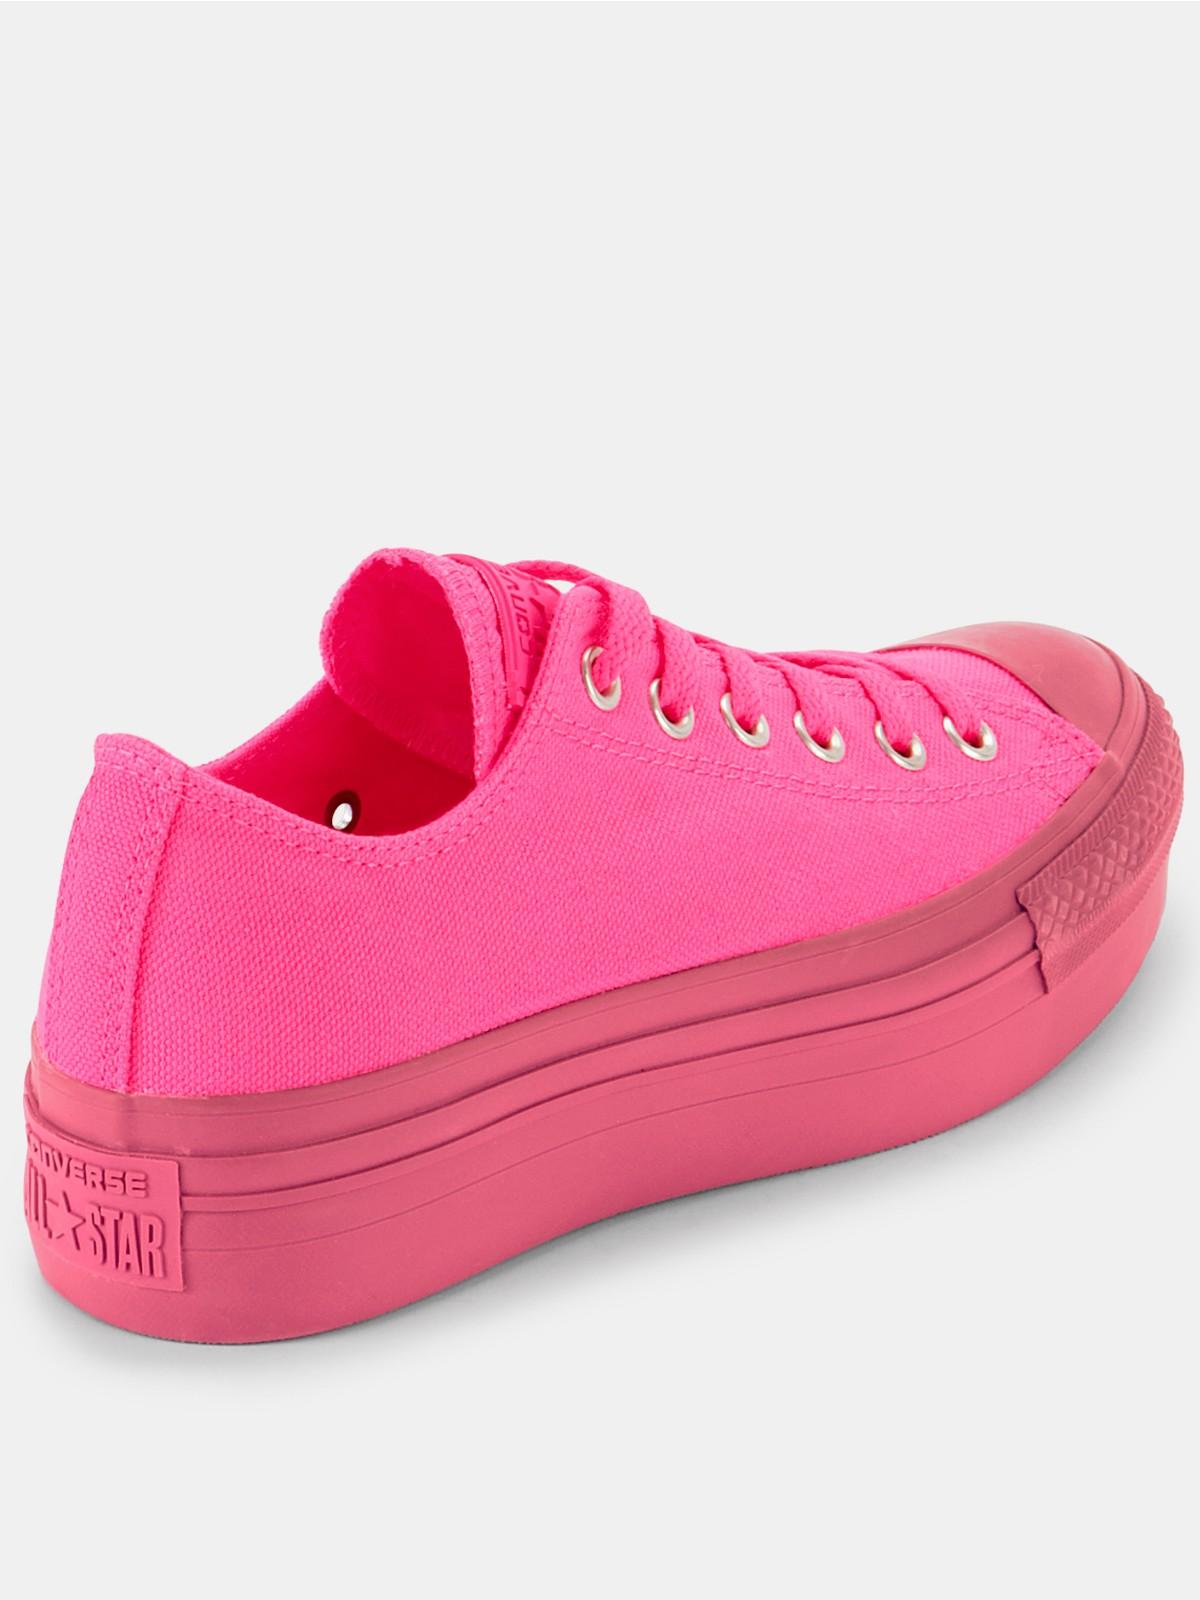 Converse Chucks Neon Pink Conversechucksdamensale De